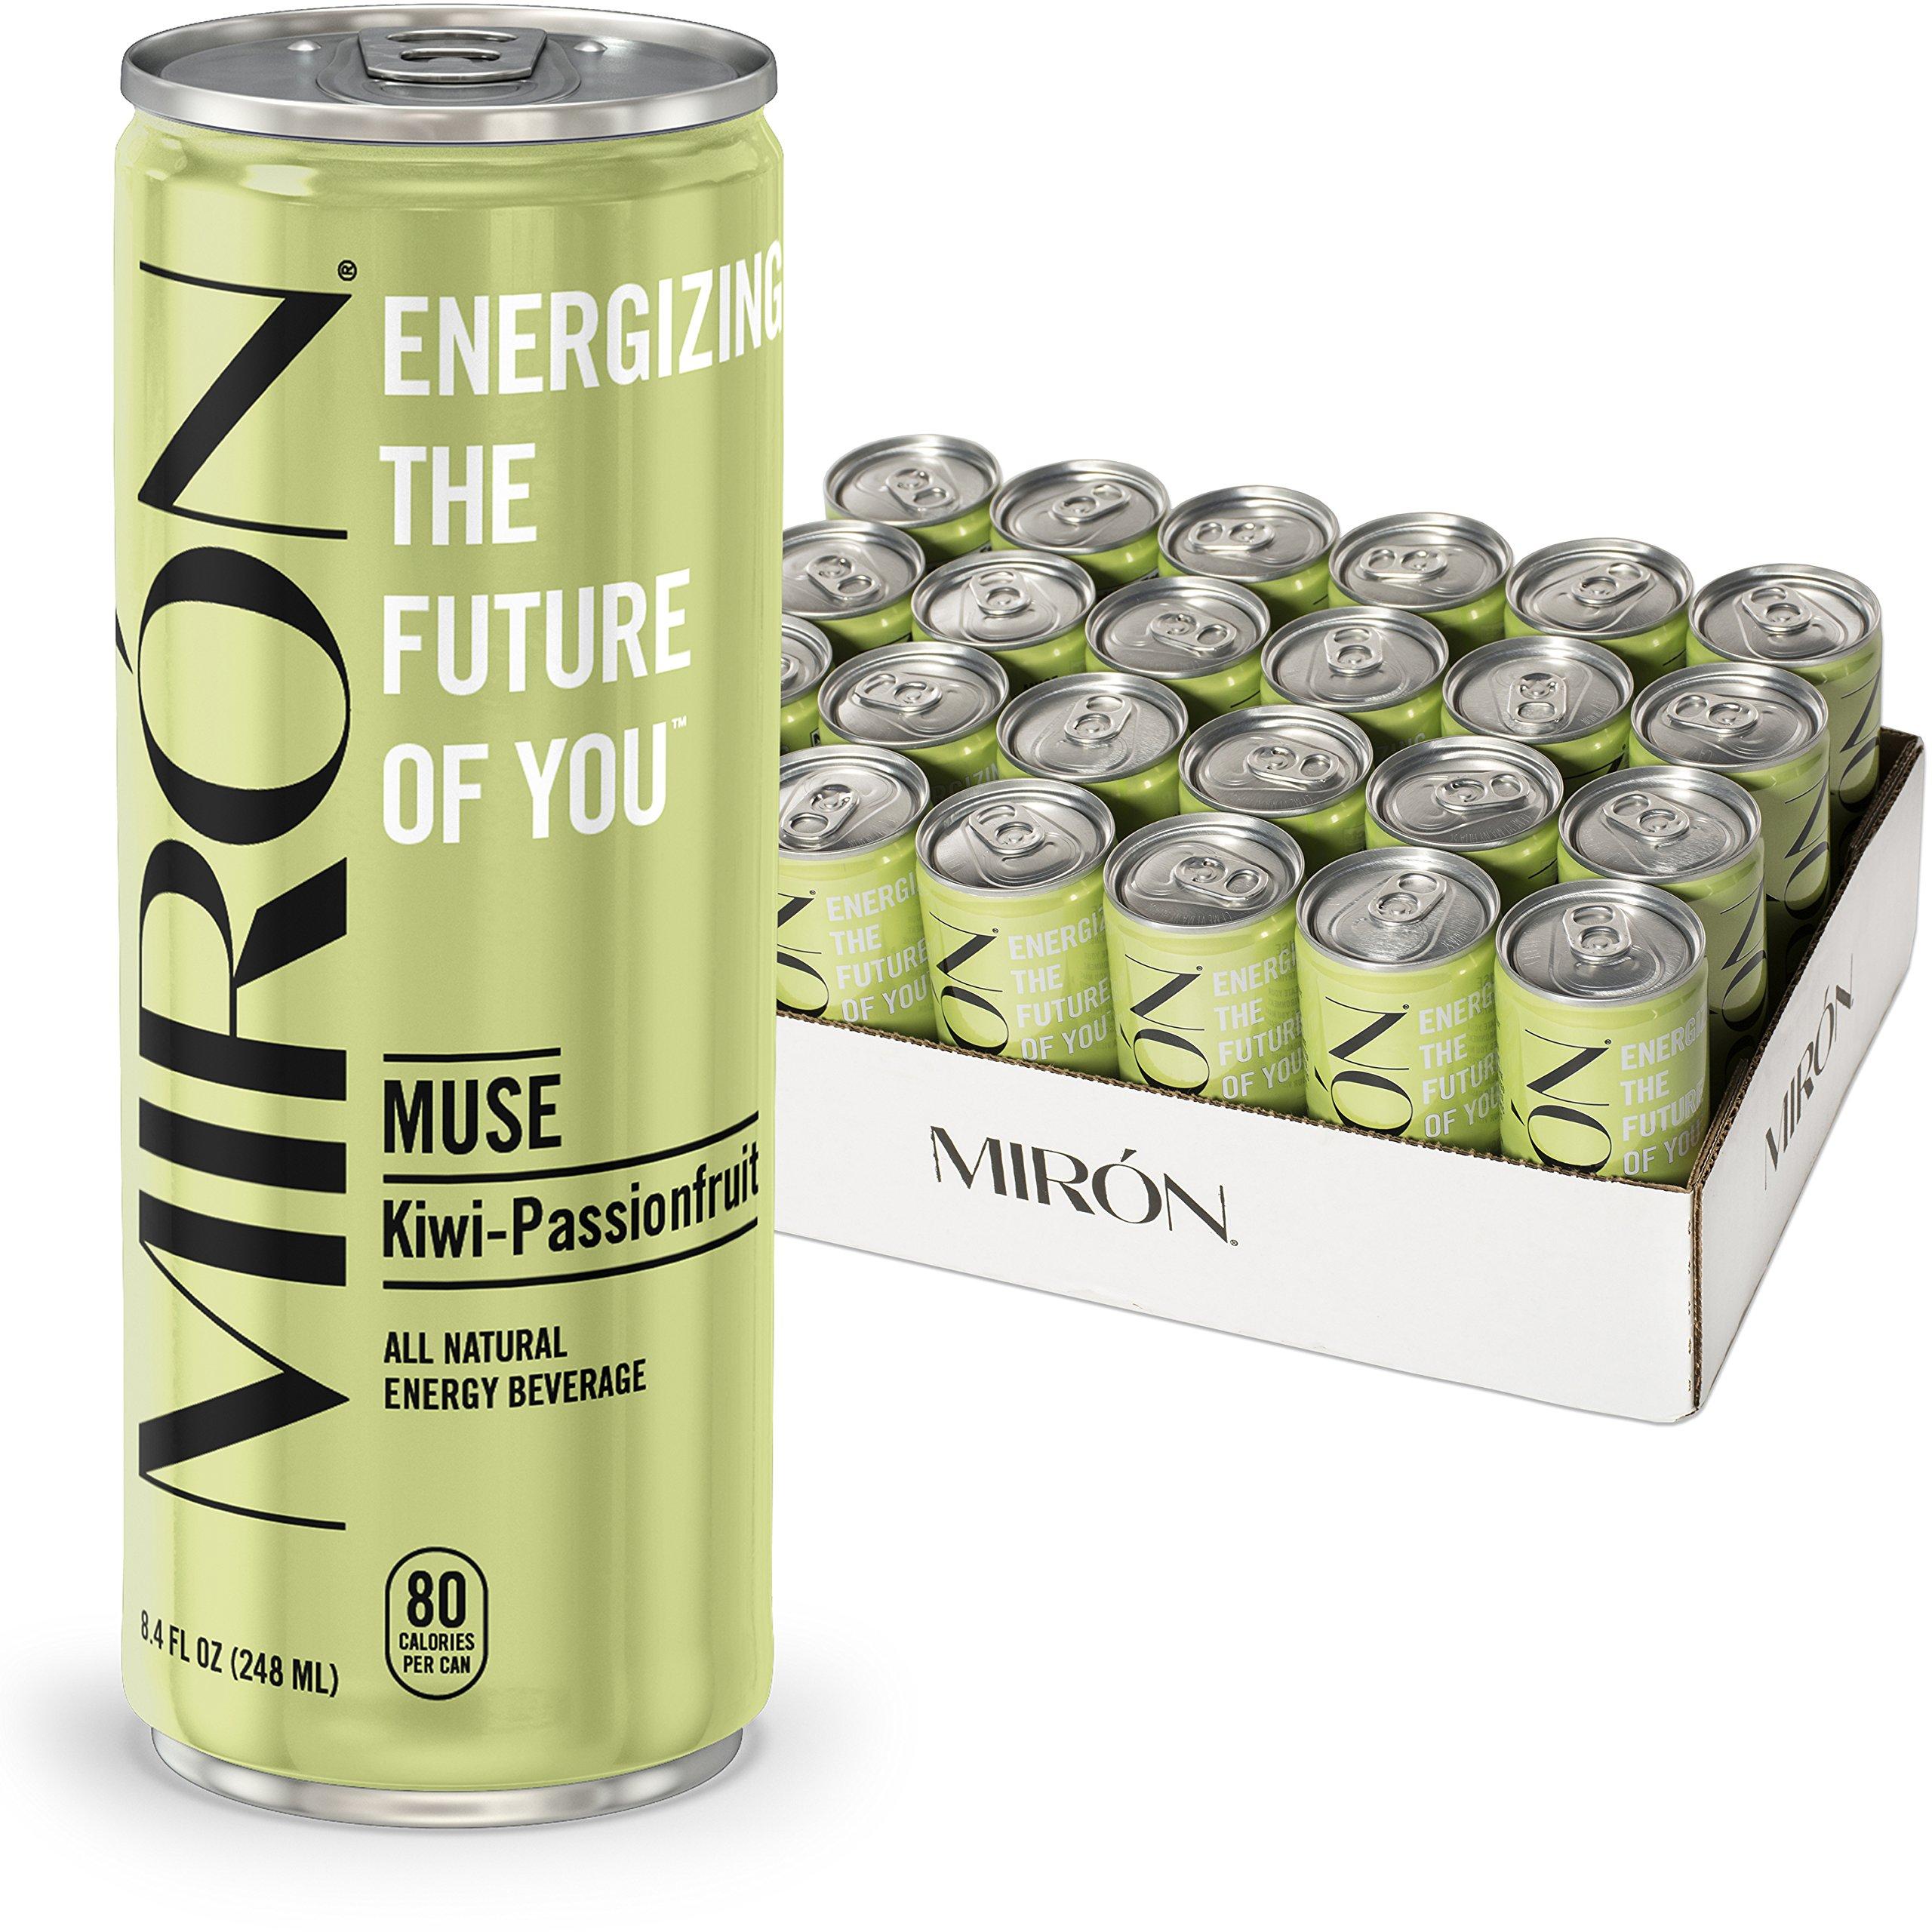 Mirón Kiwi Passionfruit All Natural Sparkling Energy Beverage 8.4 Fl.Oz. Cans (Pack of 24)